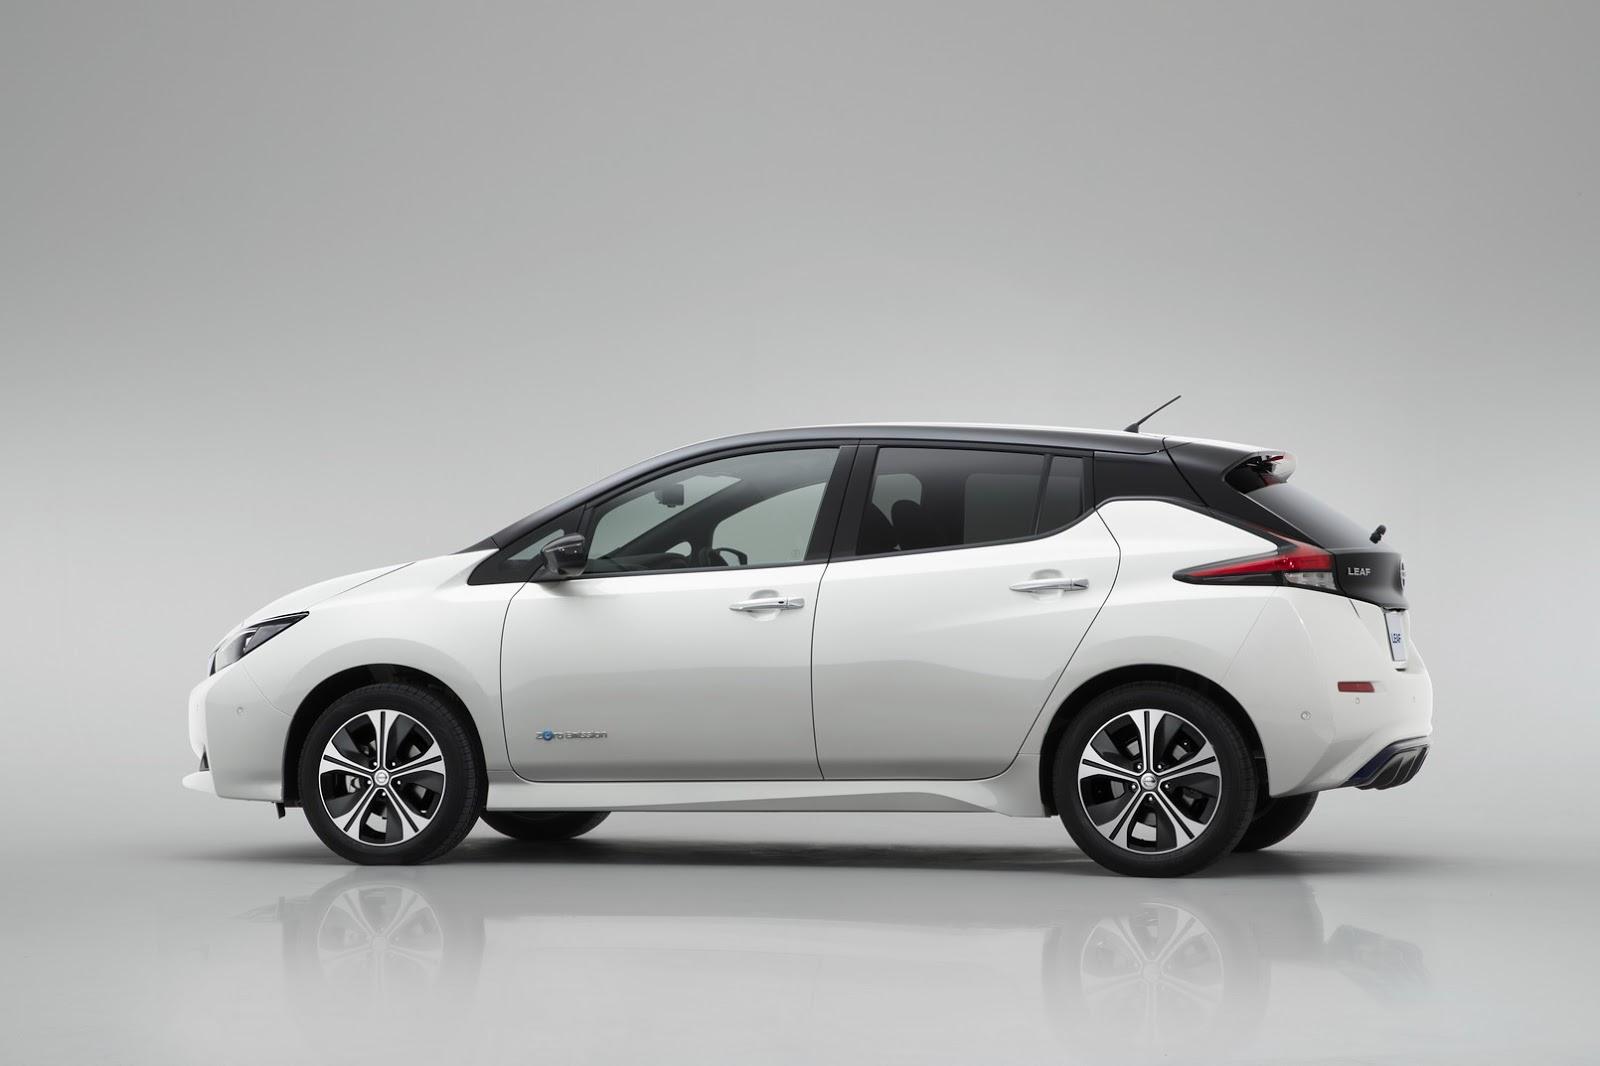 Nissan Leaf 2018 EU (7)